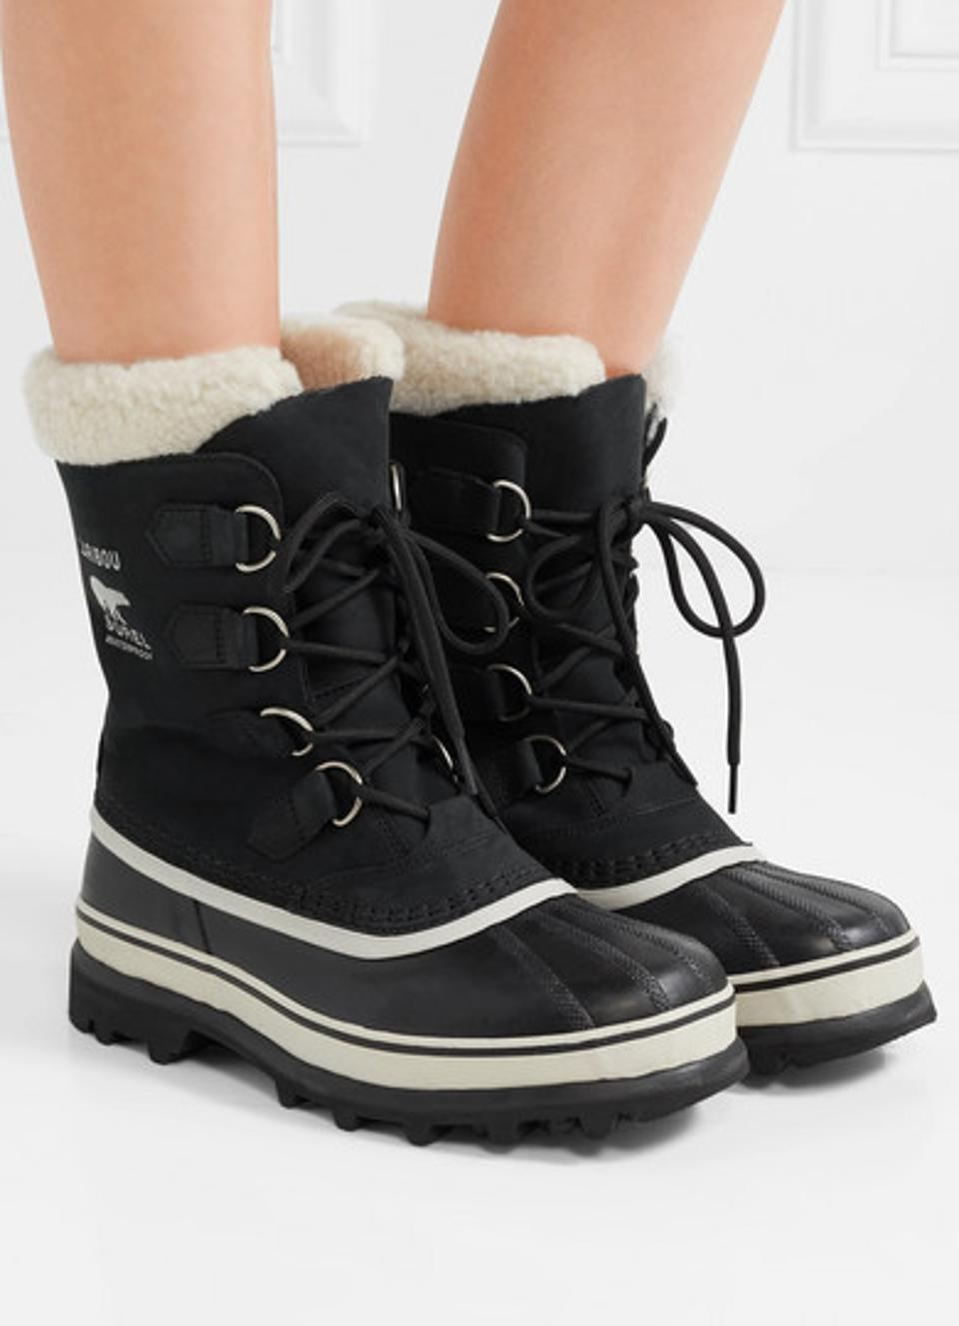 Sorel_Best Womens Winter Boots